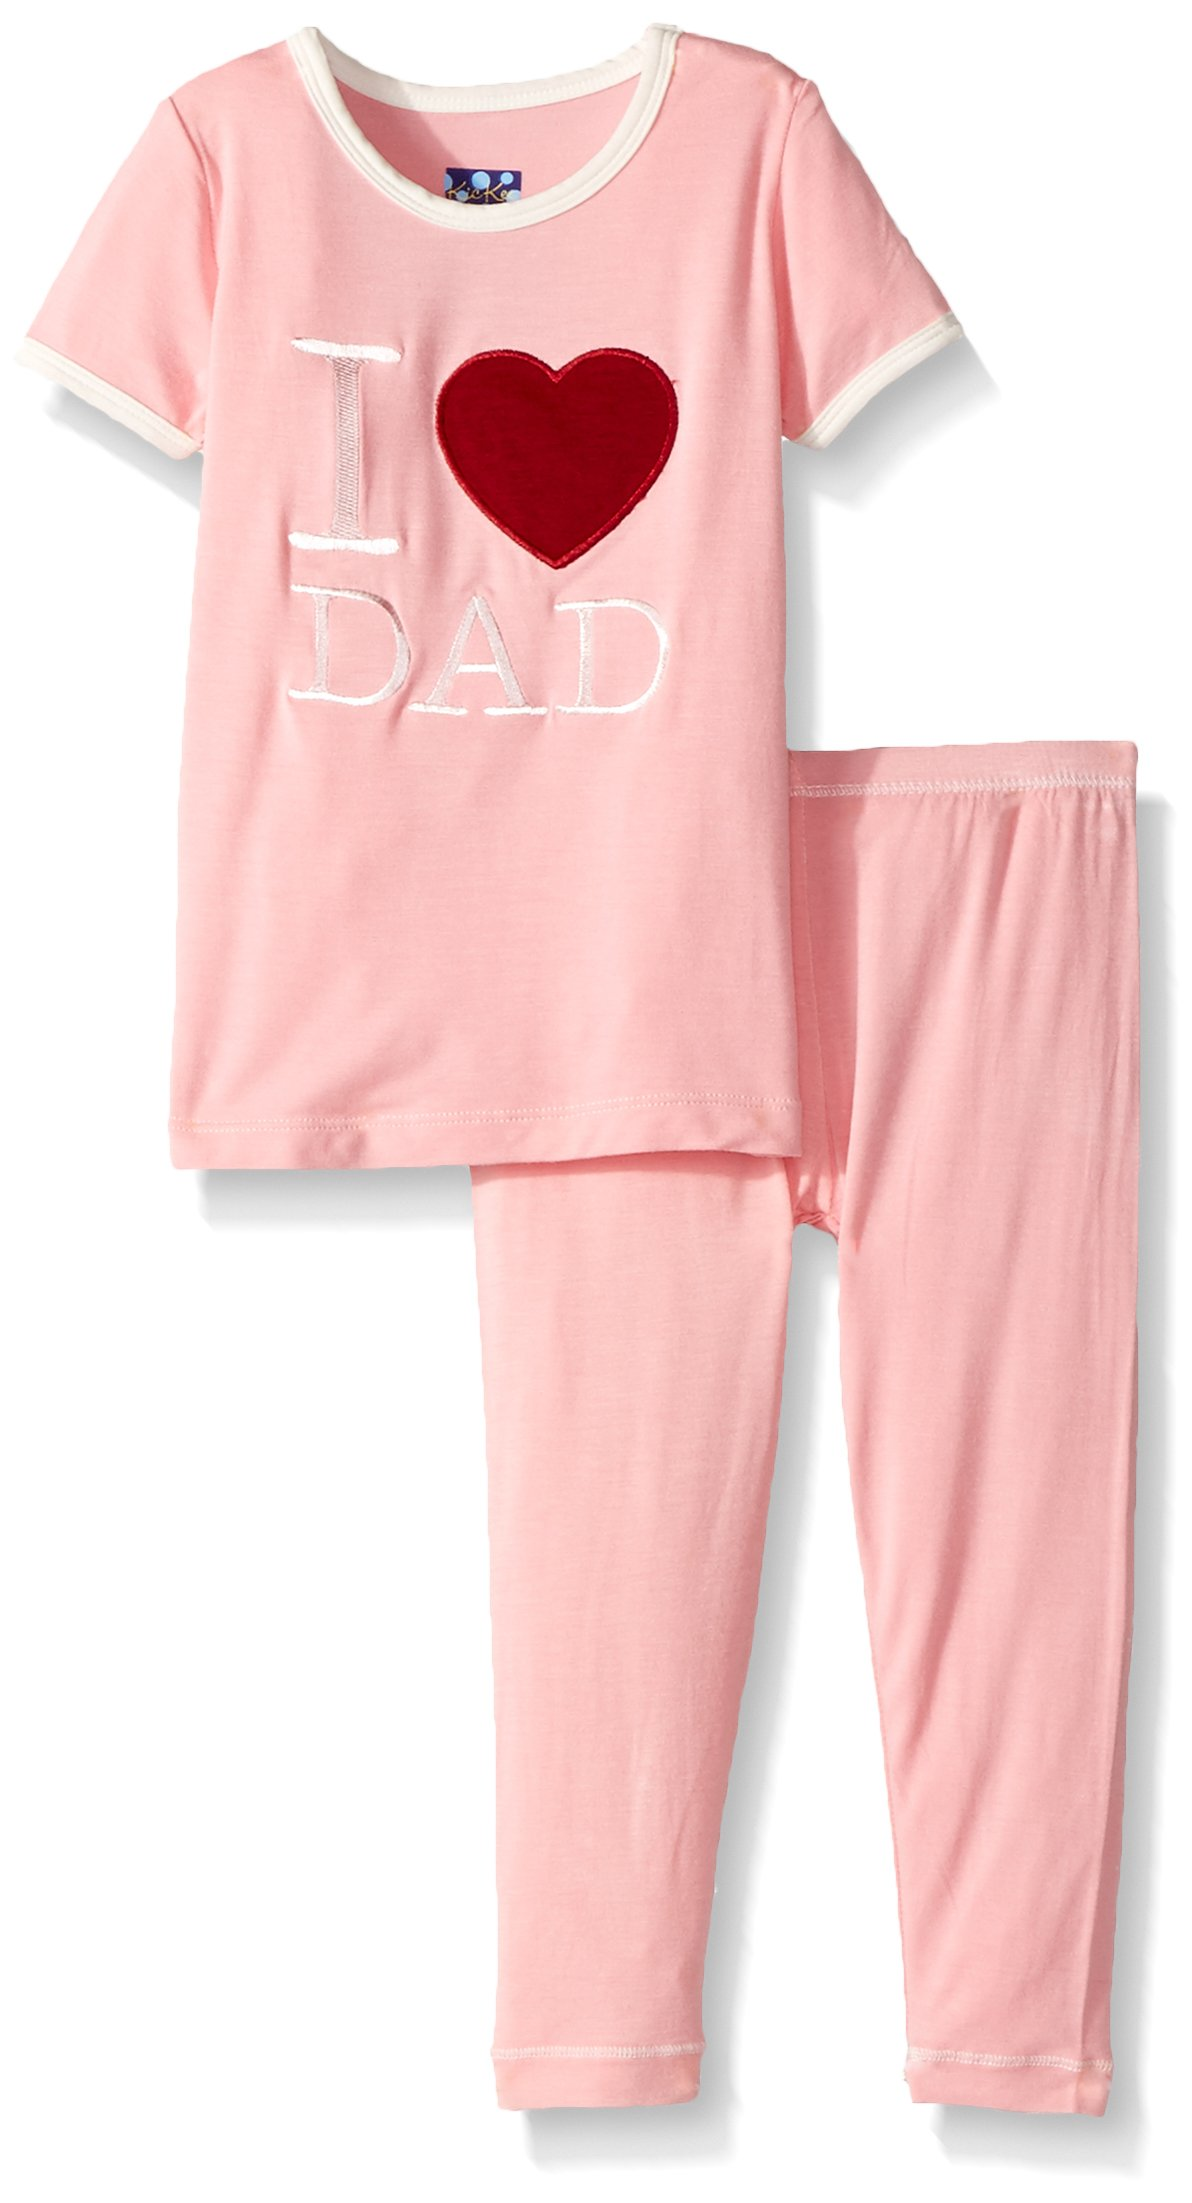 Kickee Pants Toddler Girls' Holiday Short Sleeve Applique Pajama Set, Lotus I Love Dad, 3T